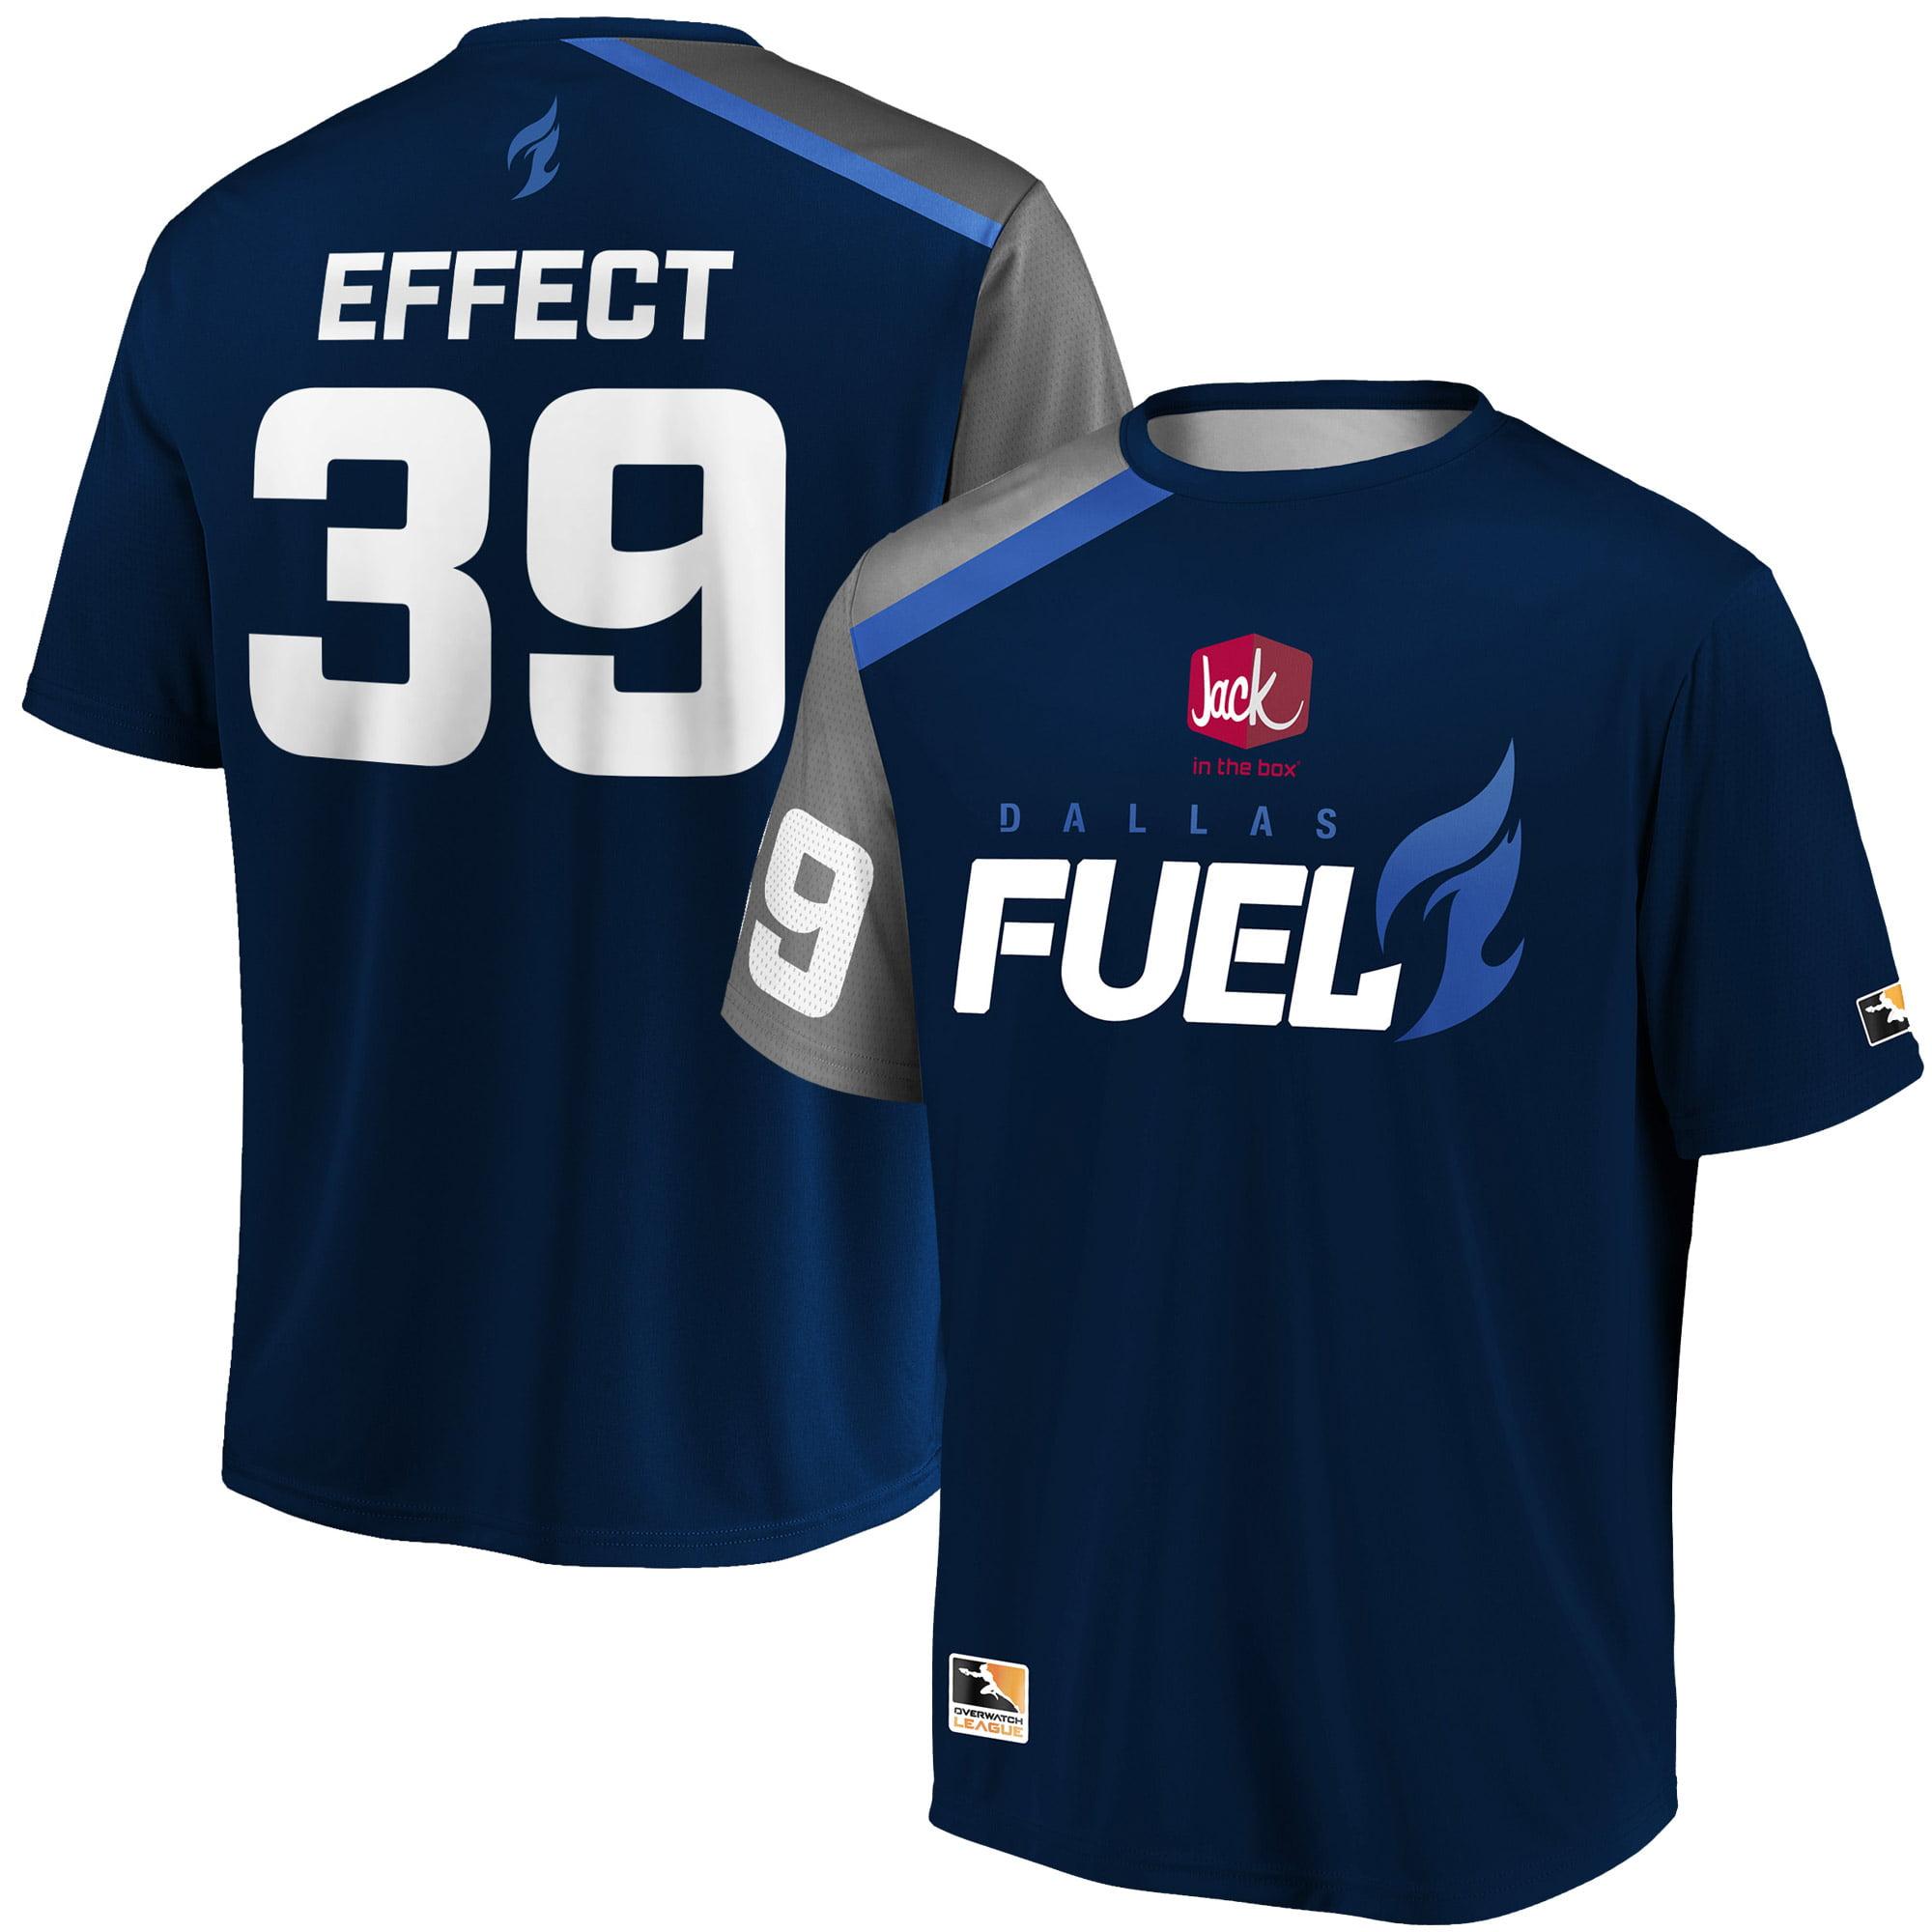 EFFECT Dallas Fuel Overwatch League Replica Home Jersey - Navy